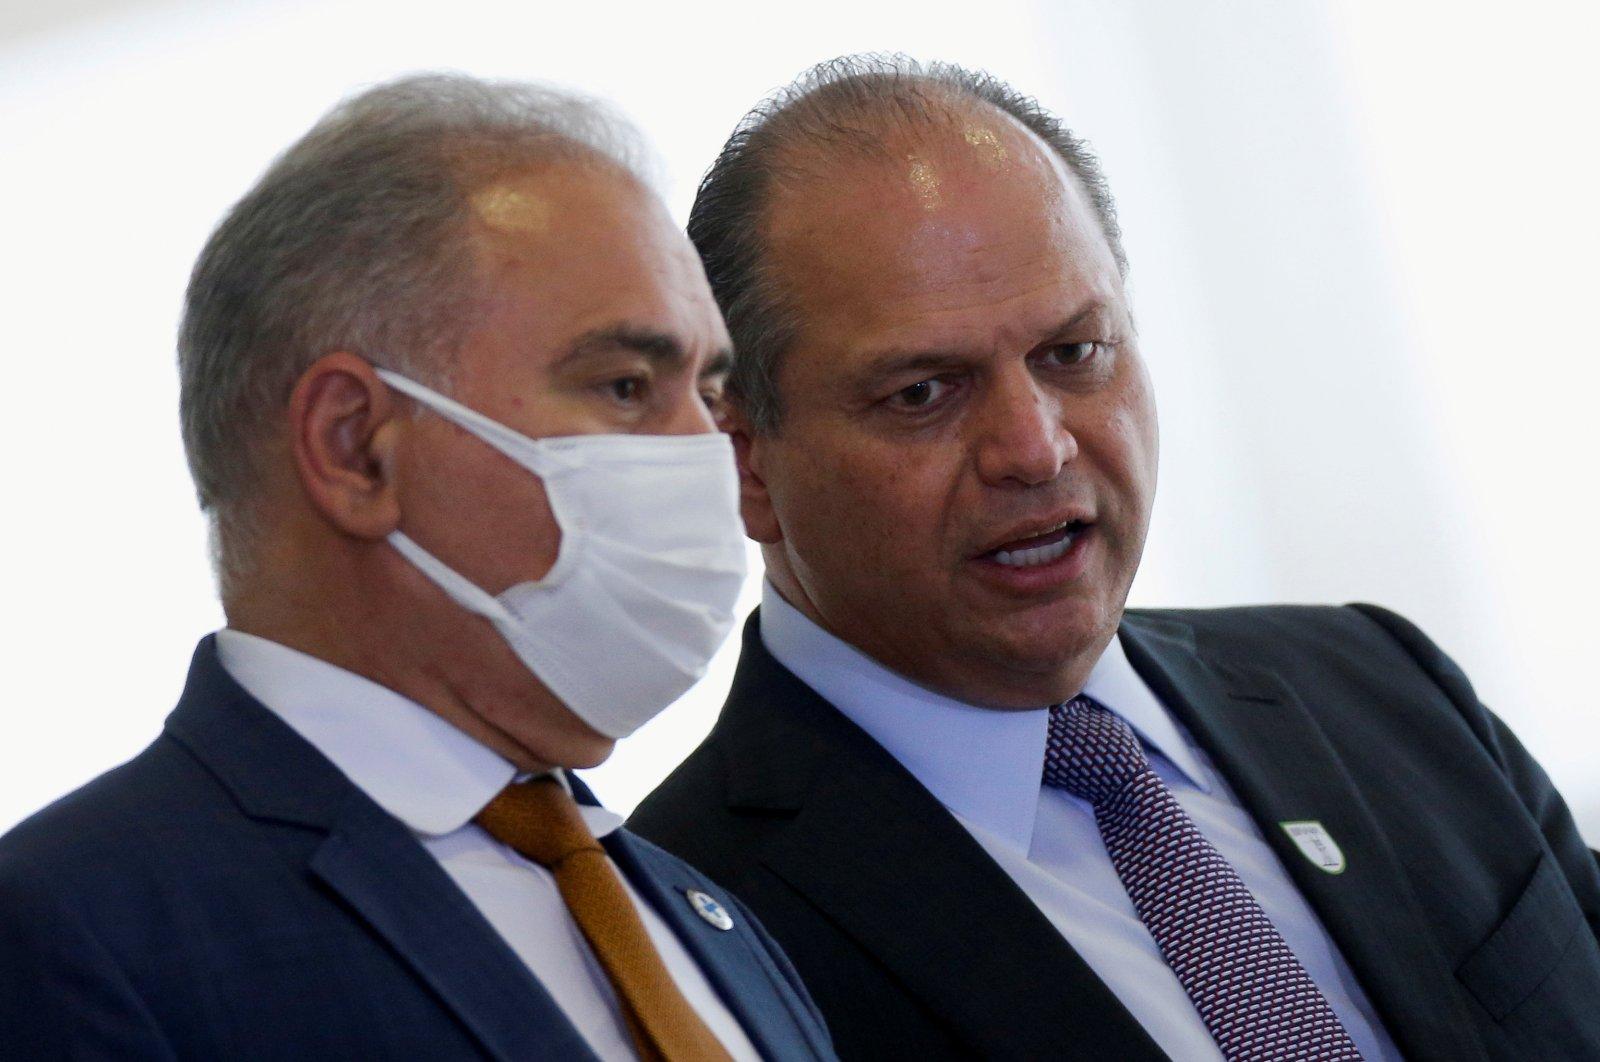 Brazil's Health Minister Marcelo Queiroga (L) talks with Brazilian Deputy Ricardo Barros (R) before a ceremony at the Planalto Palace in Brasilia, Brazil, Sept. 14, 2021. (Reuters Photo)